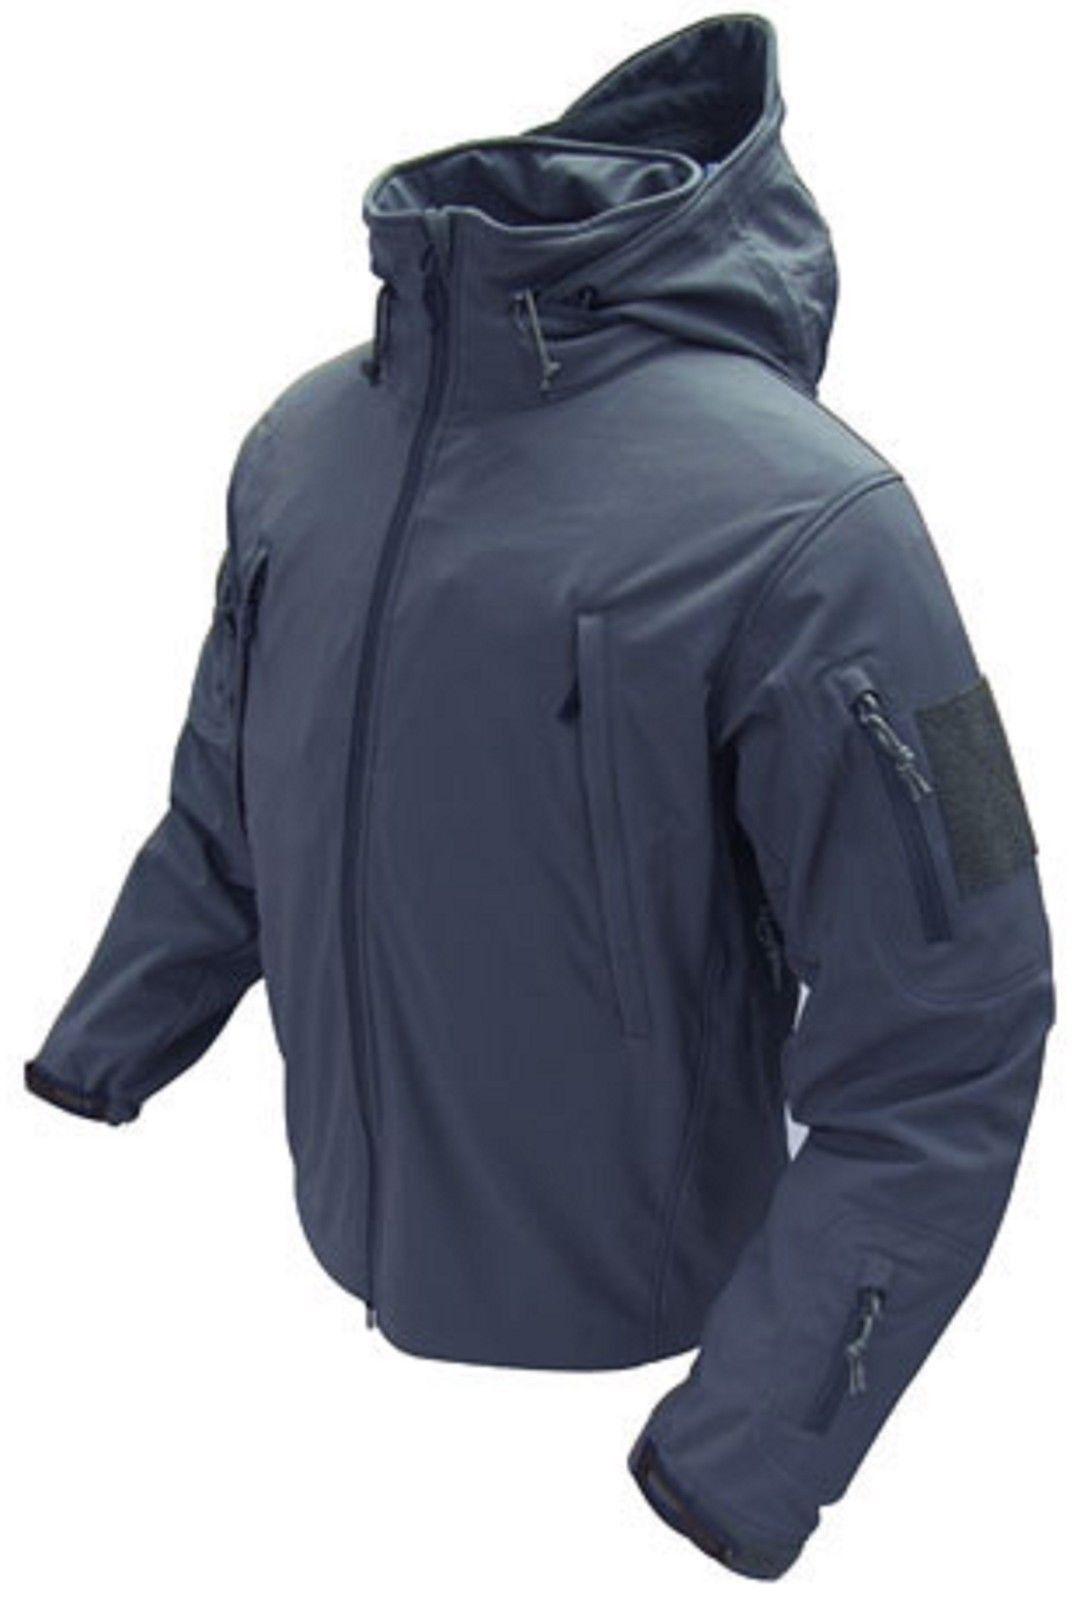 Men S Condor Summit Softshell Tactical Jacket 3 Layer Reinforced Winter Coat Ropa Tactica Pantalones De Combate Moda Men [ 1600 x 1077 Pixel ]